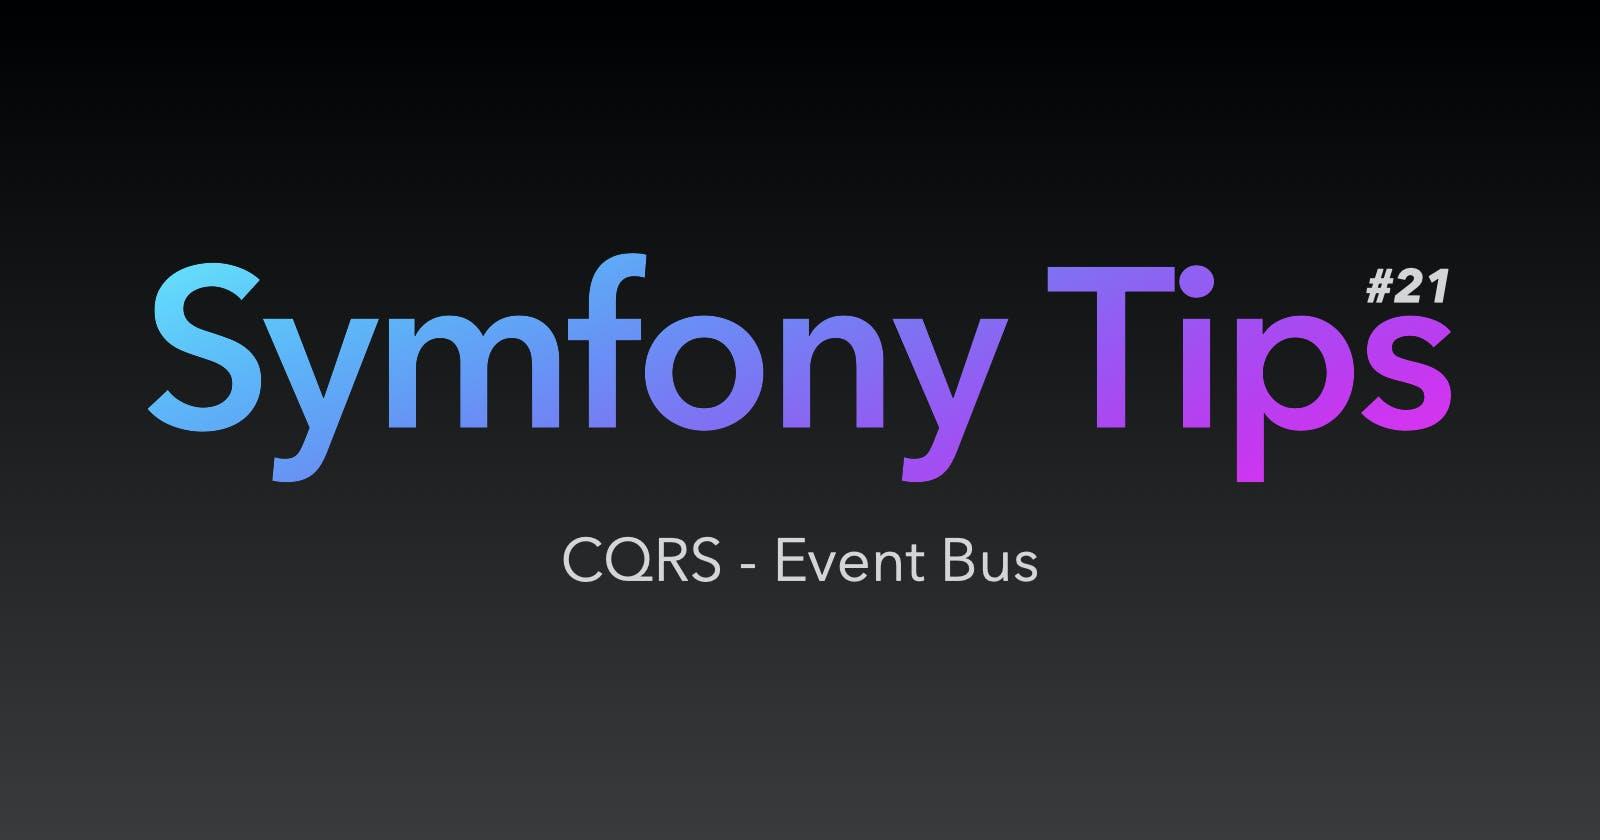 Symfony Tips #21 - CQRS - Event Bus